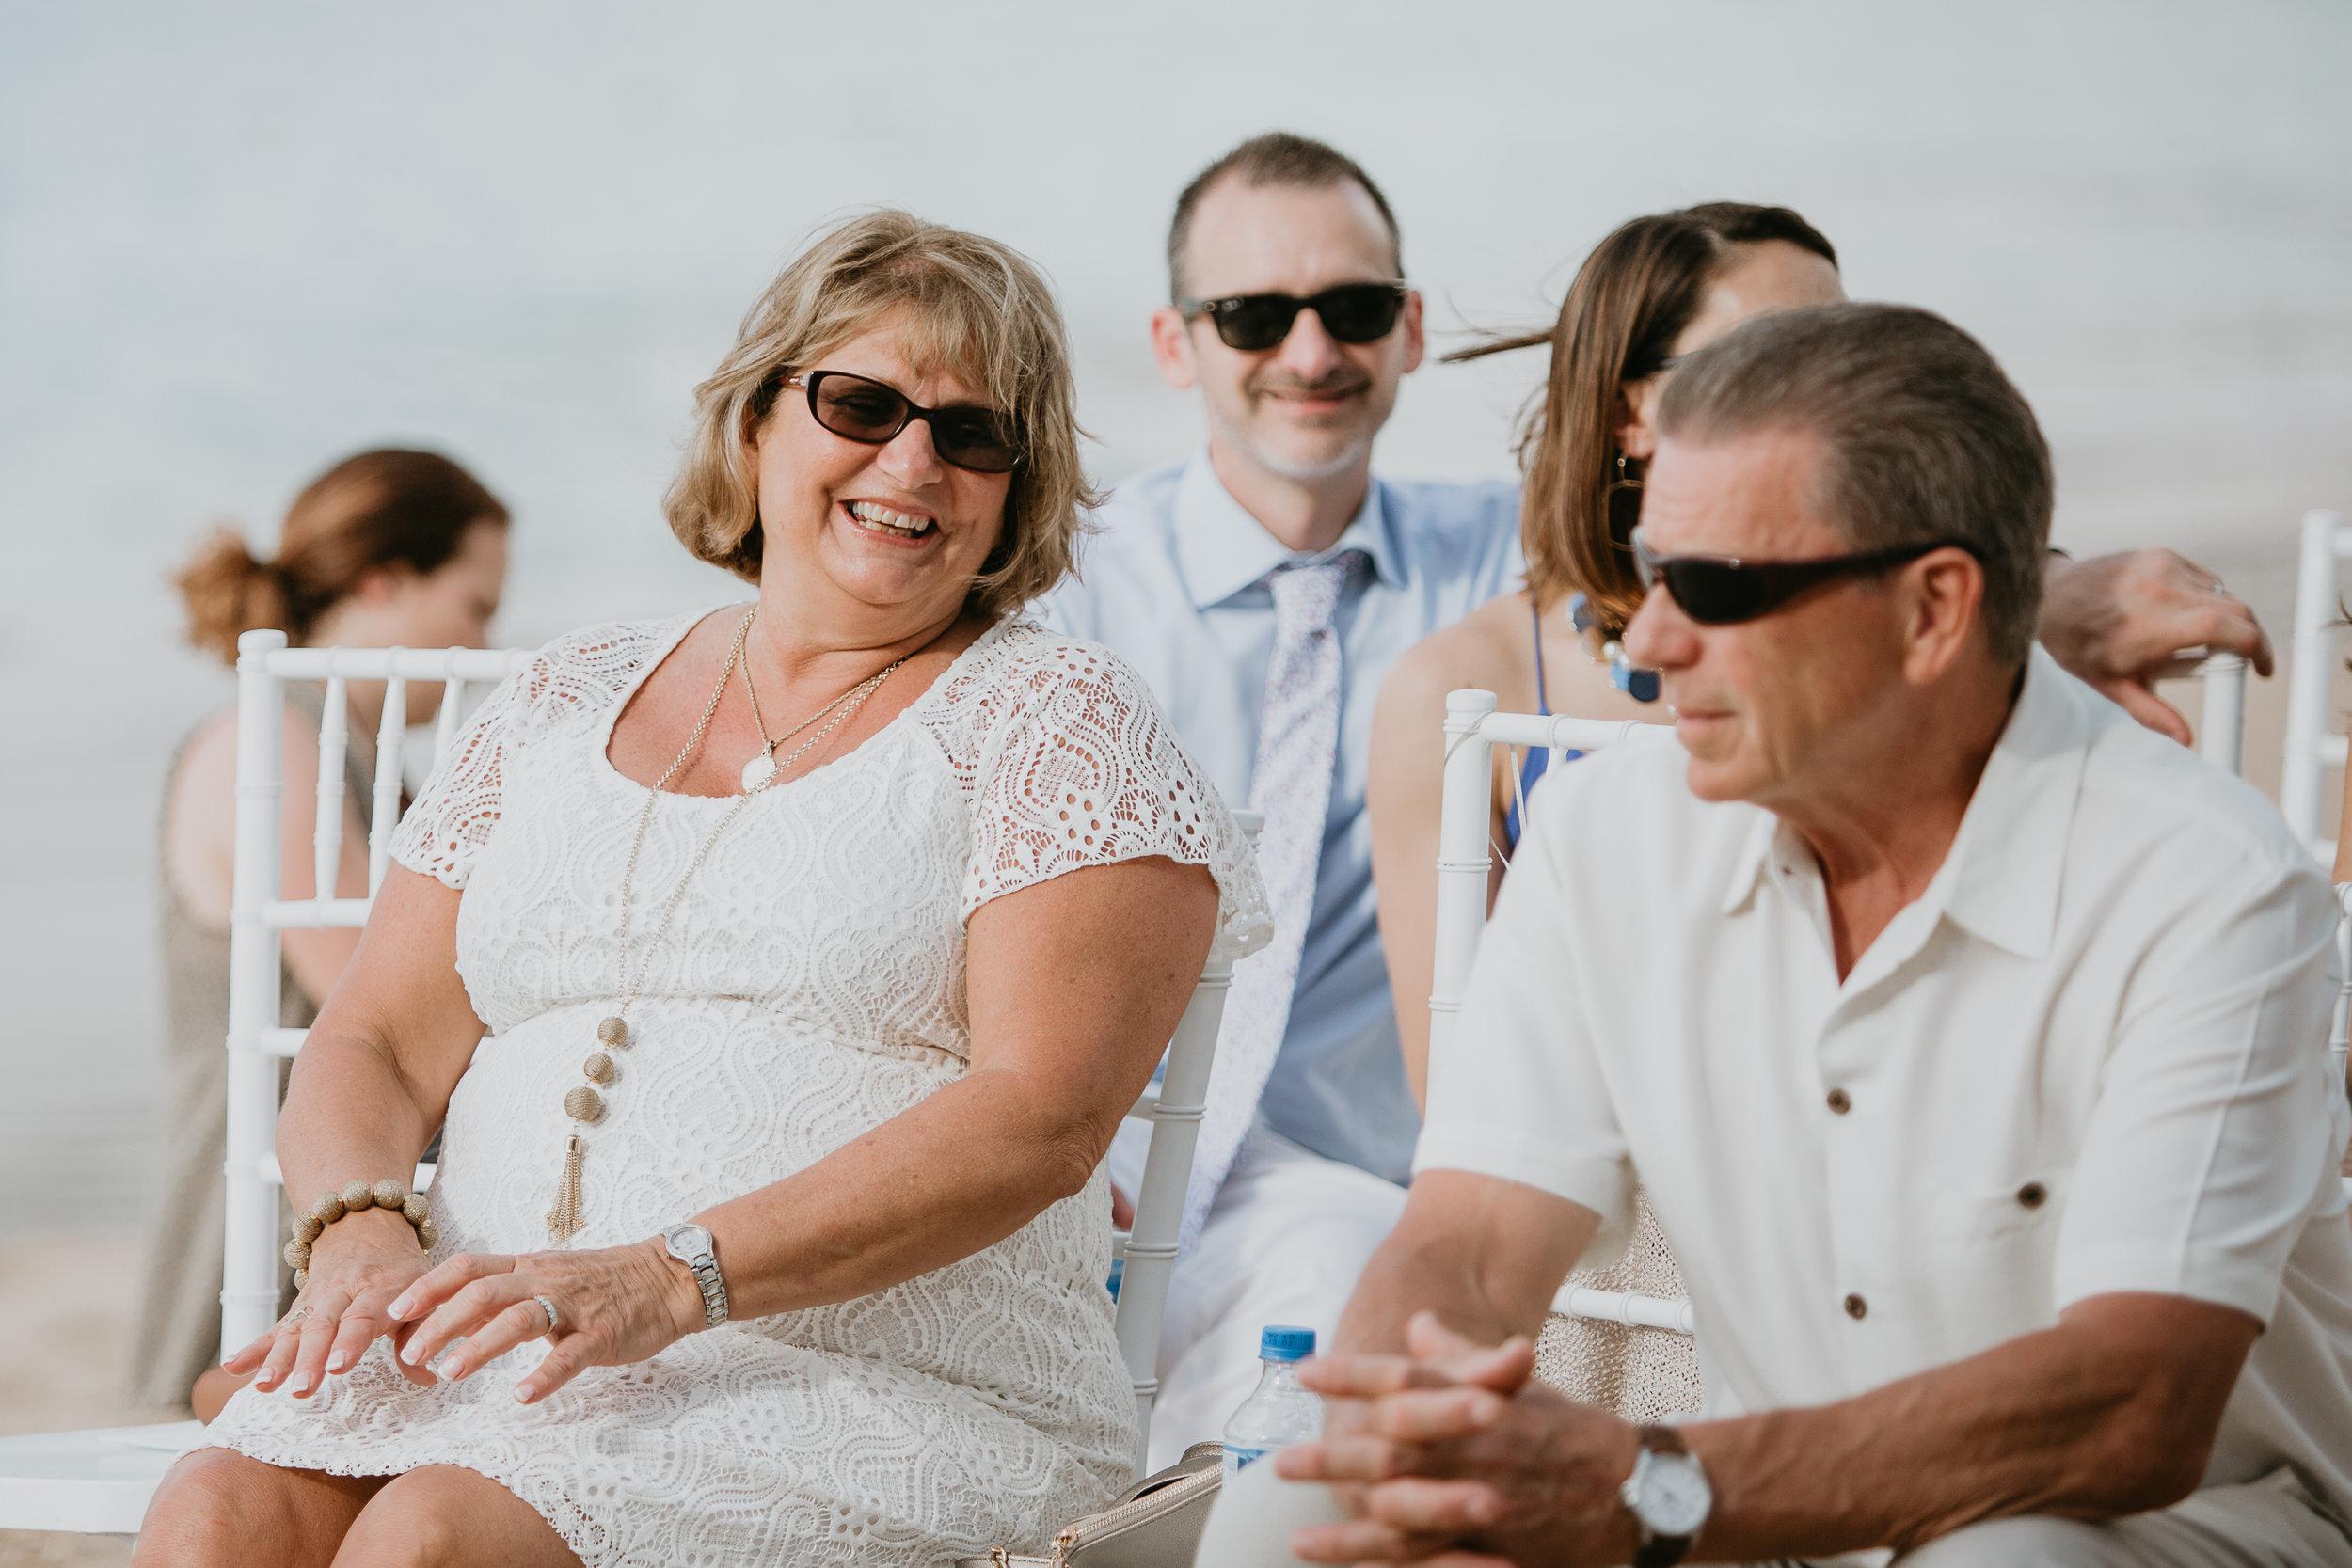 nicole-daacke-photography-destination-wedding-in-st-lucia-sandals-la-toc-intimate-island-wedding-carribean-elopement-photographer-chill-island-wedding-53.jpg